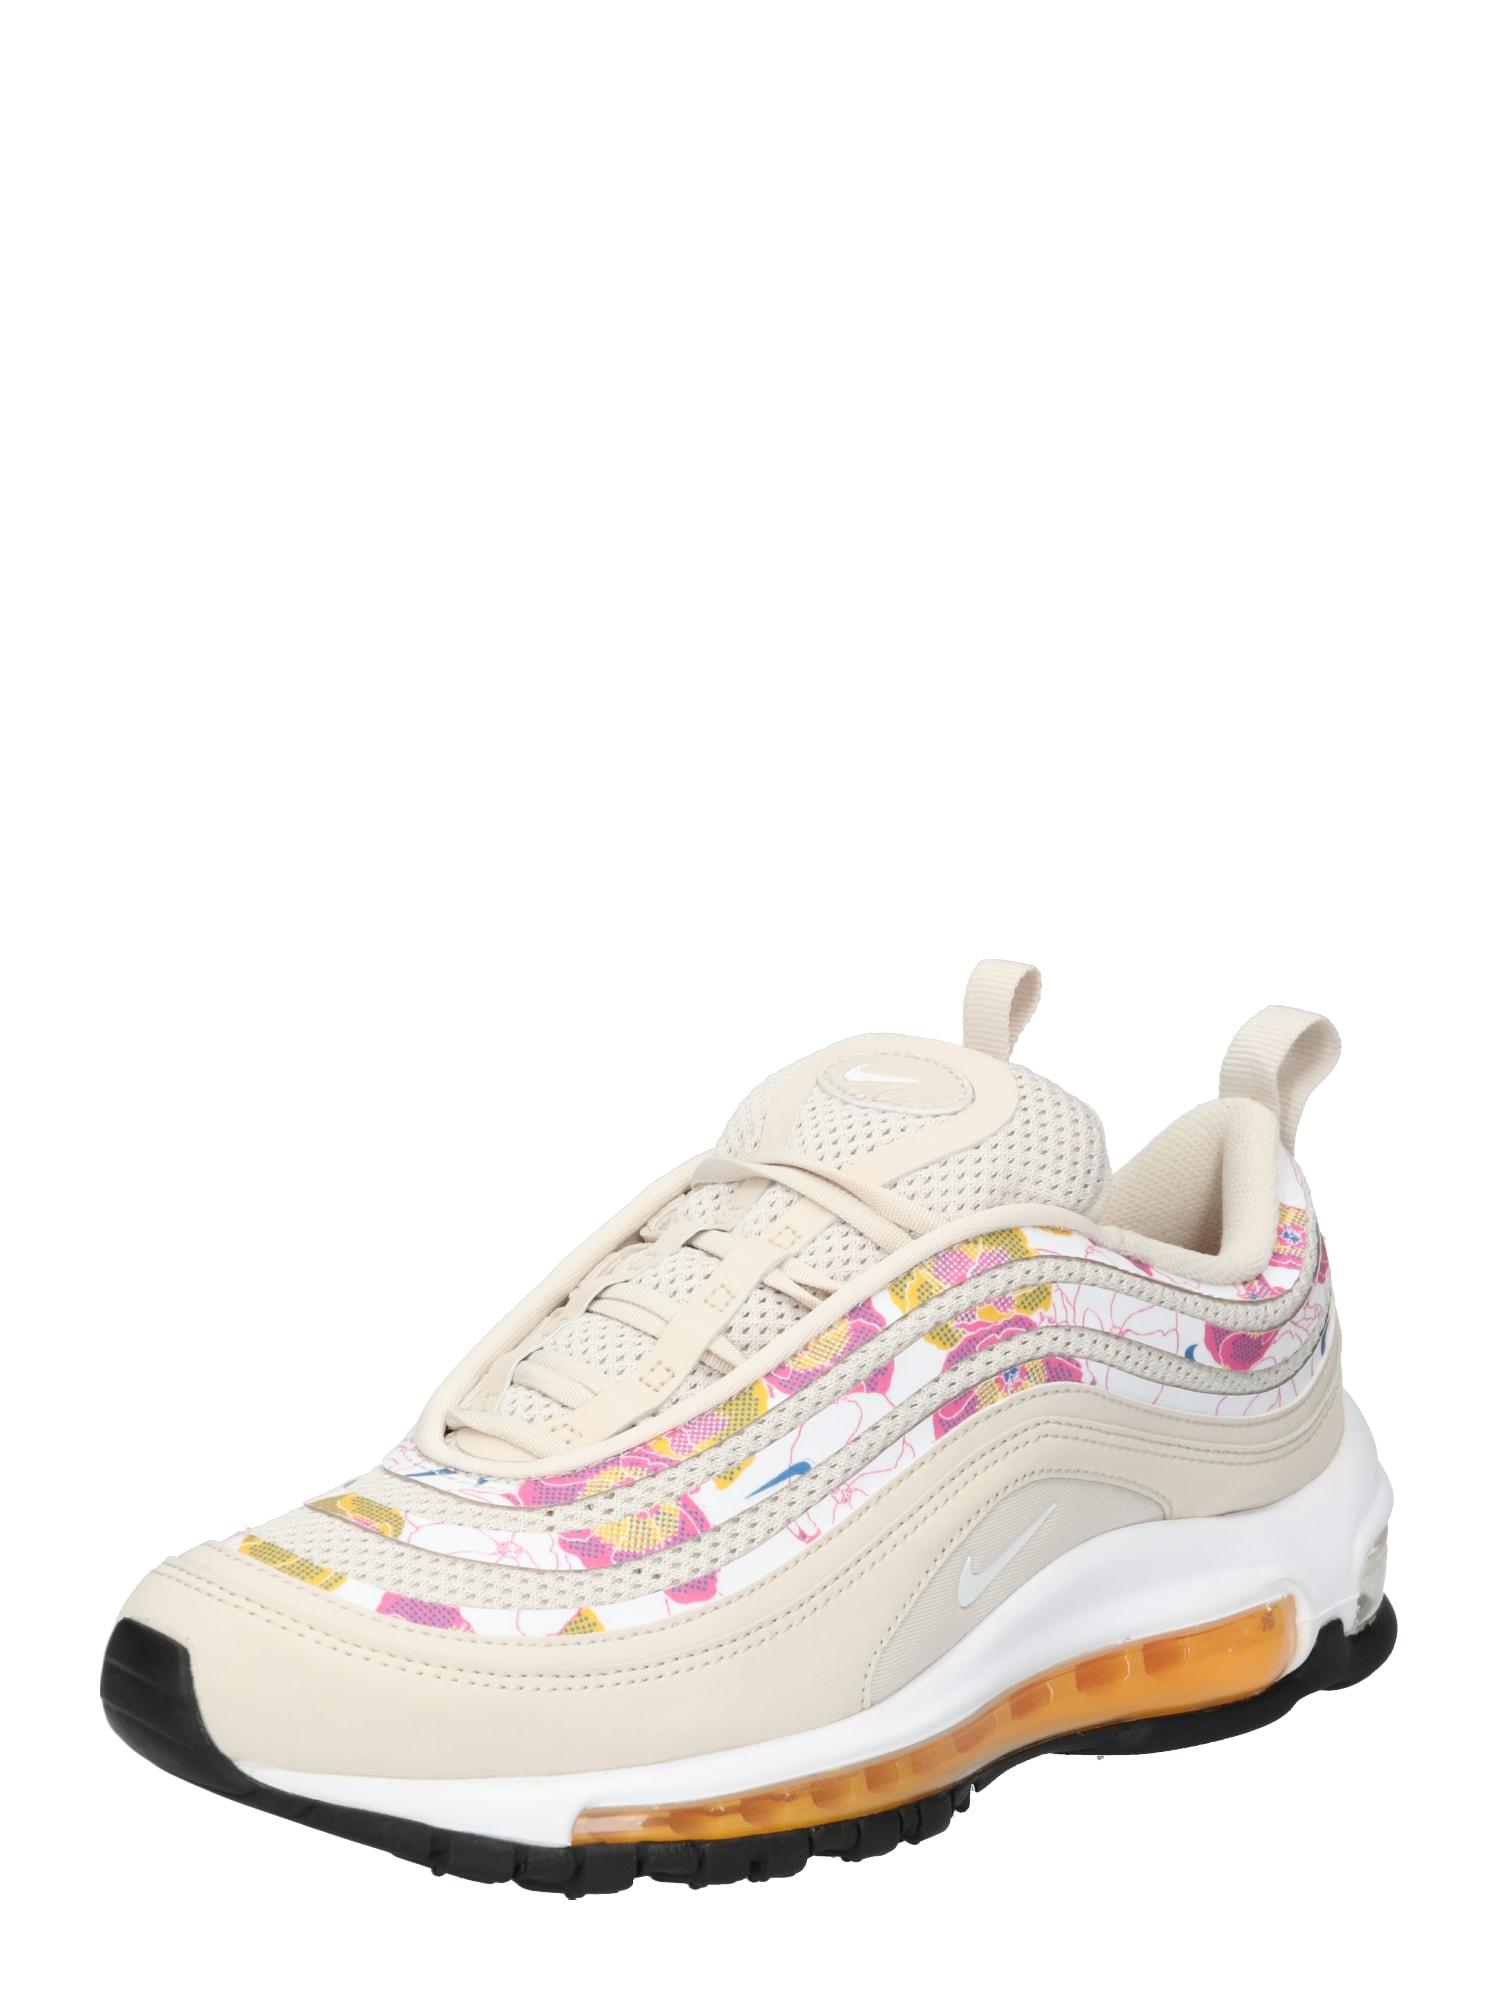 Tenisky AIR MAX 97 SE béžová mix barev Nike Sportswear